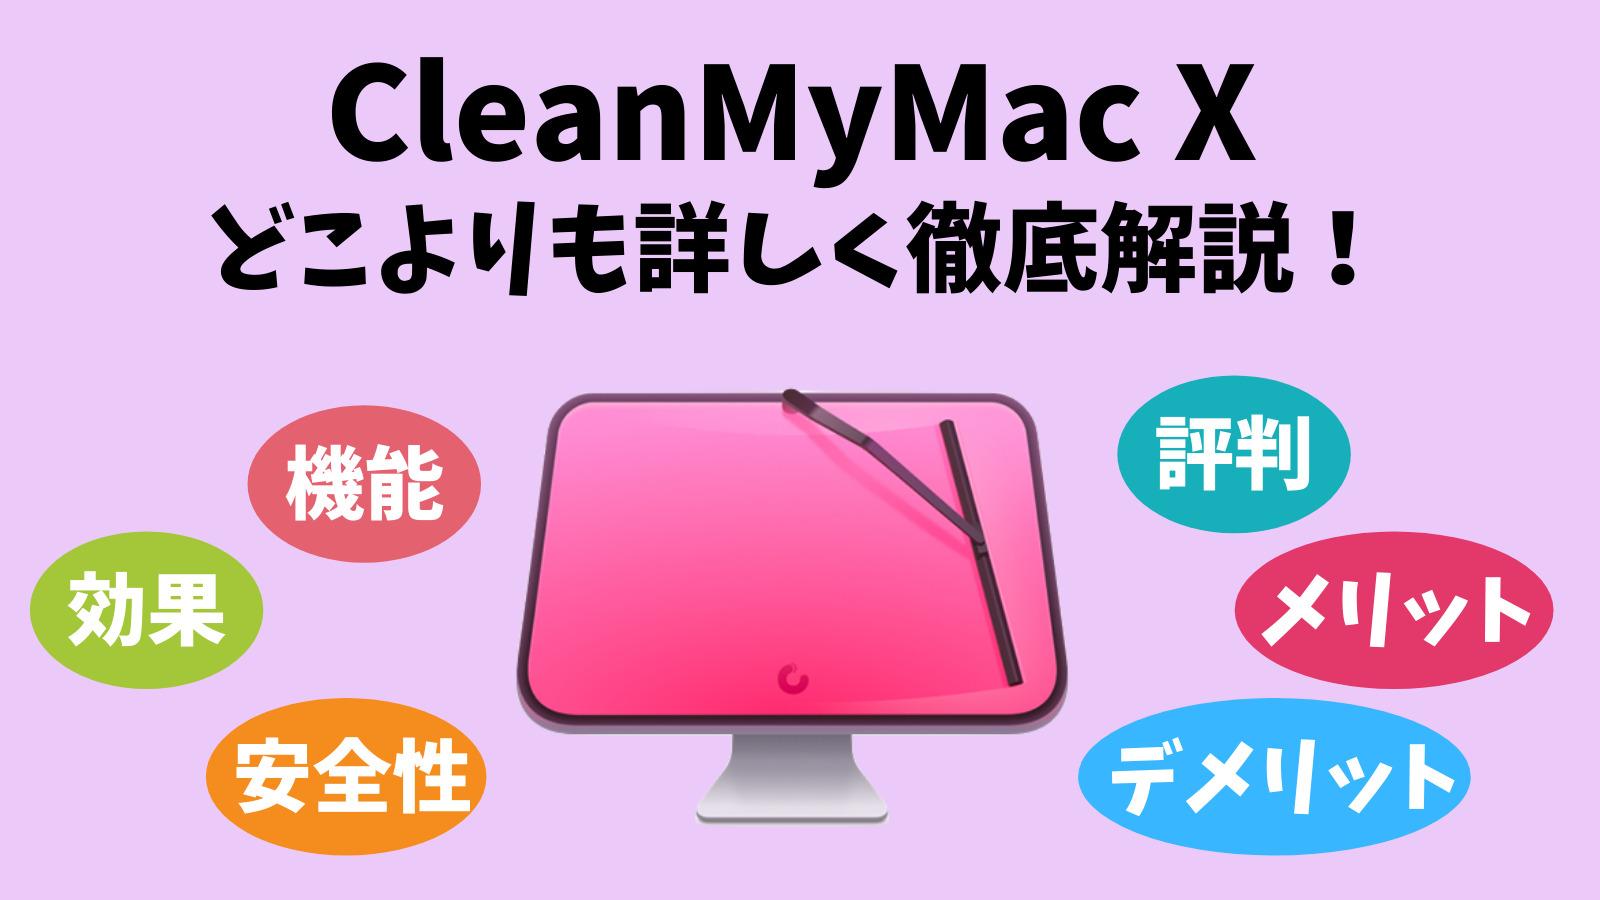 「CleanMyMac X」の評判・口コミ|価格に見合う効果があるか徹底解説